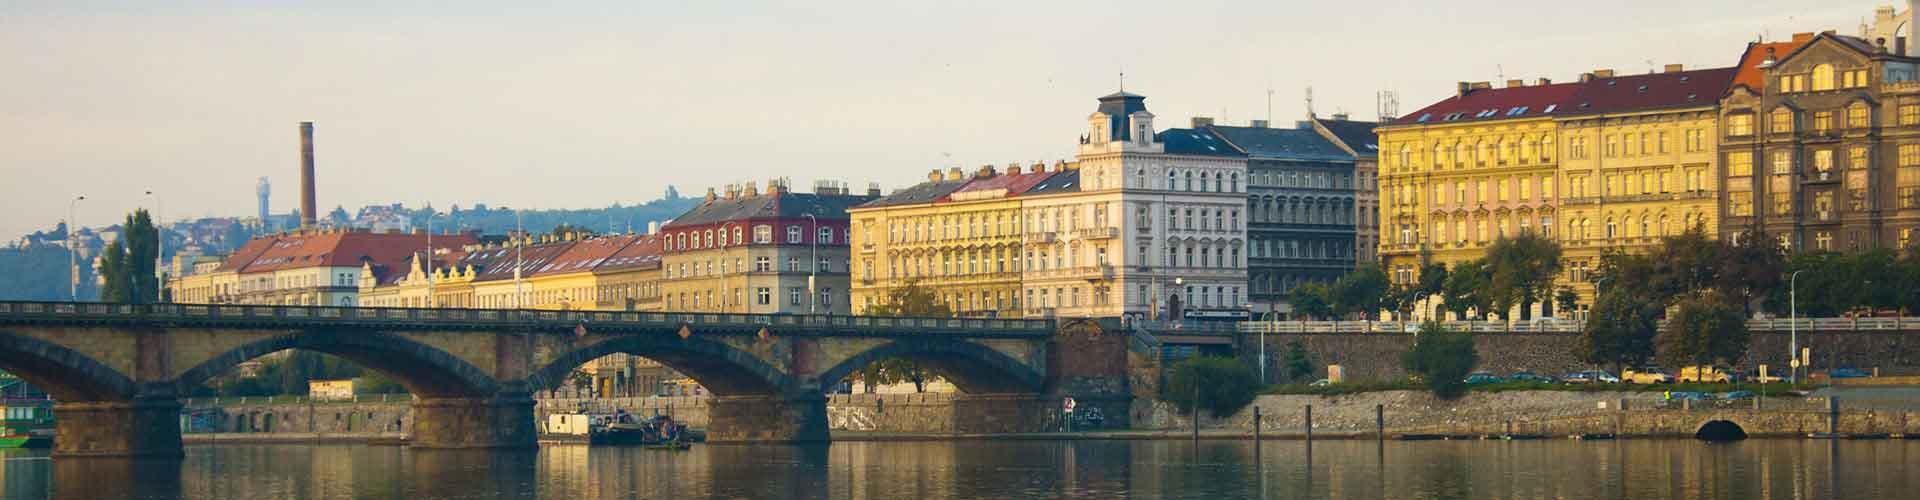 Praga – Alberghi nella zona Praga 2. Mappe per Praga, Foto e  Recensioni per ogni Albergo a Praga.